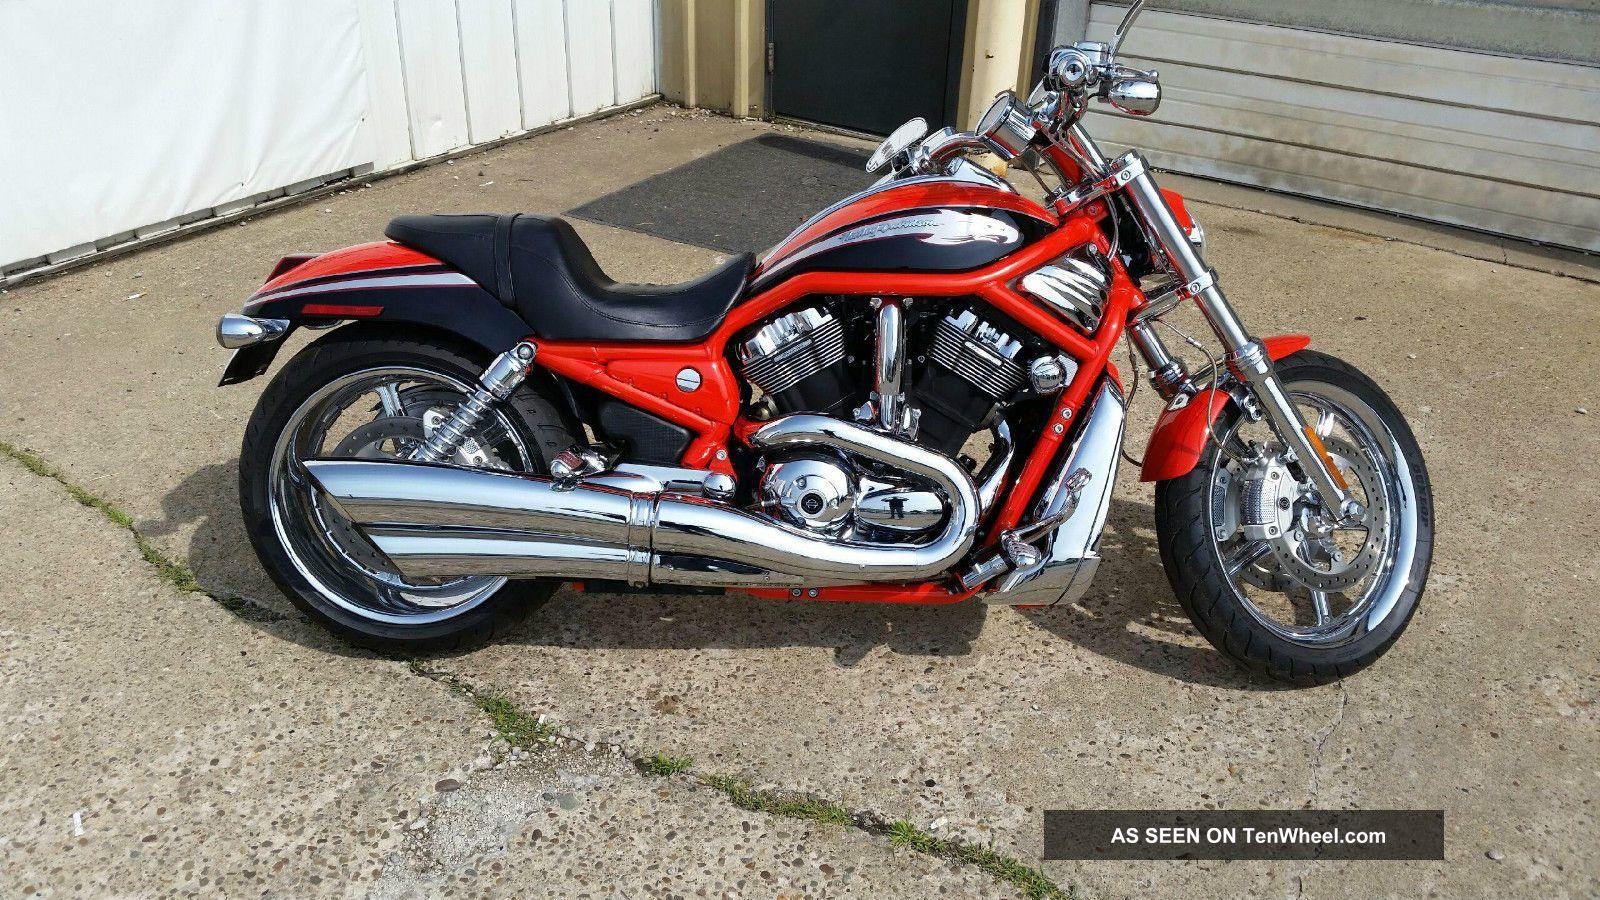 2006 Harley Davidson Orange Screaming Eagle V Rod Extremely